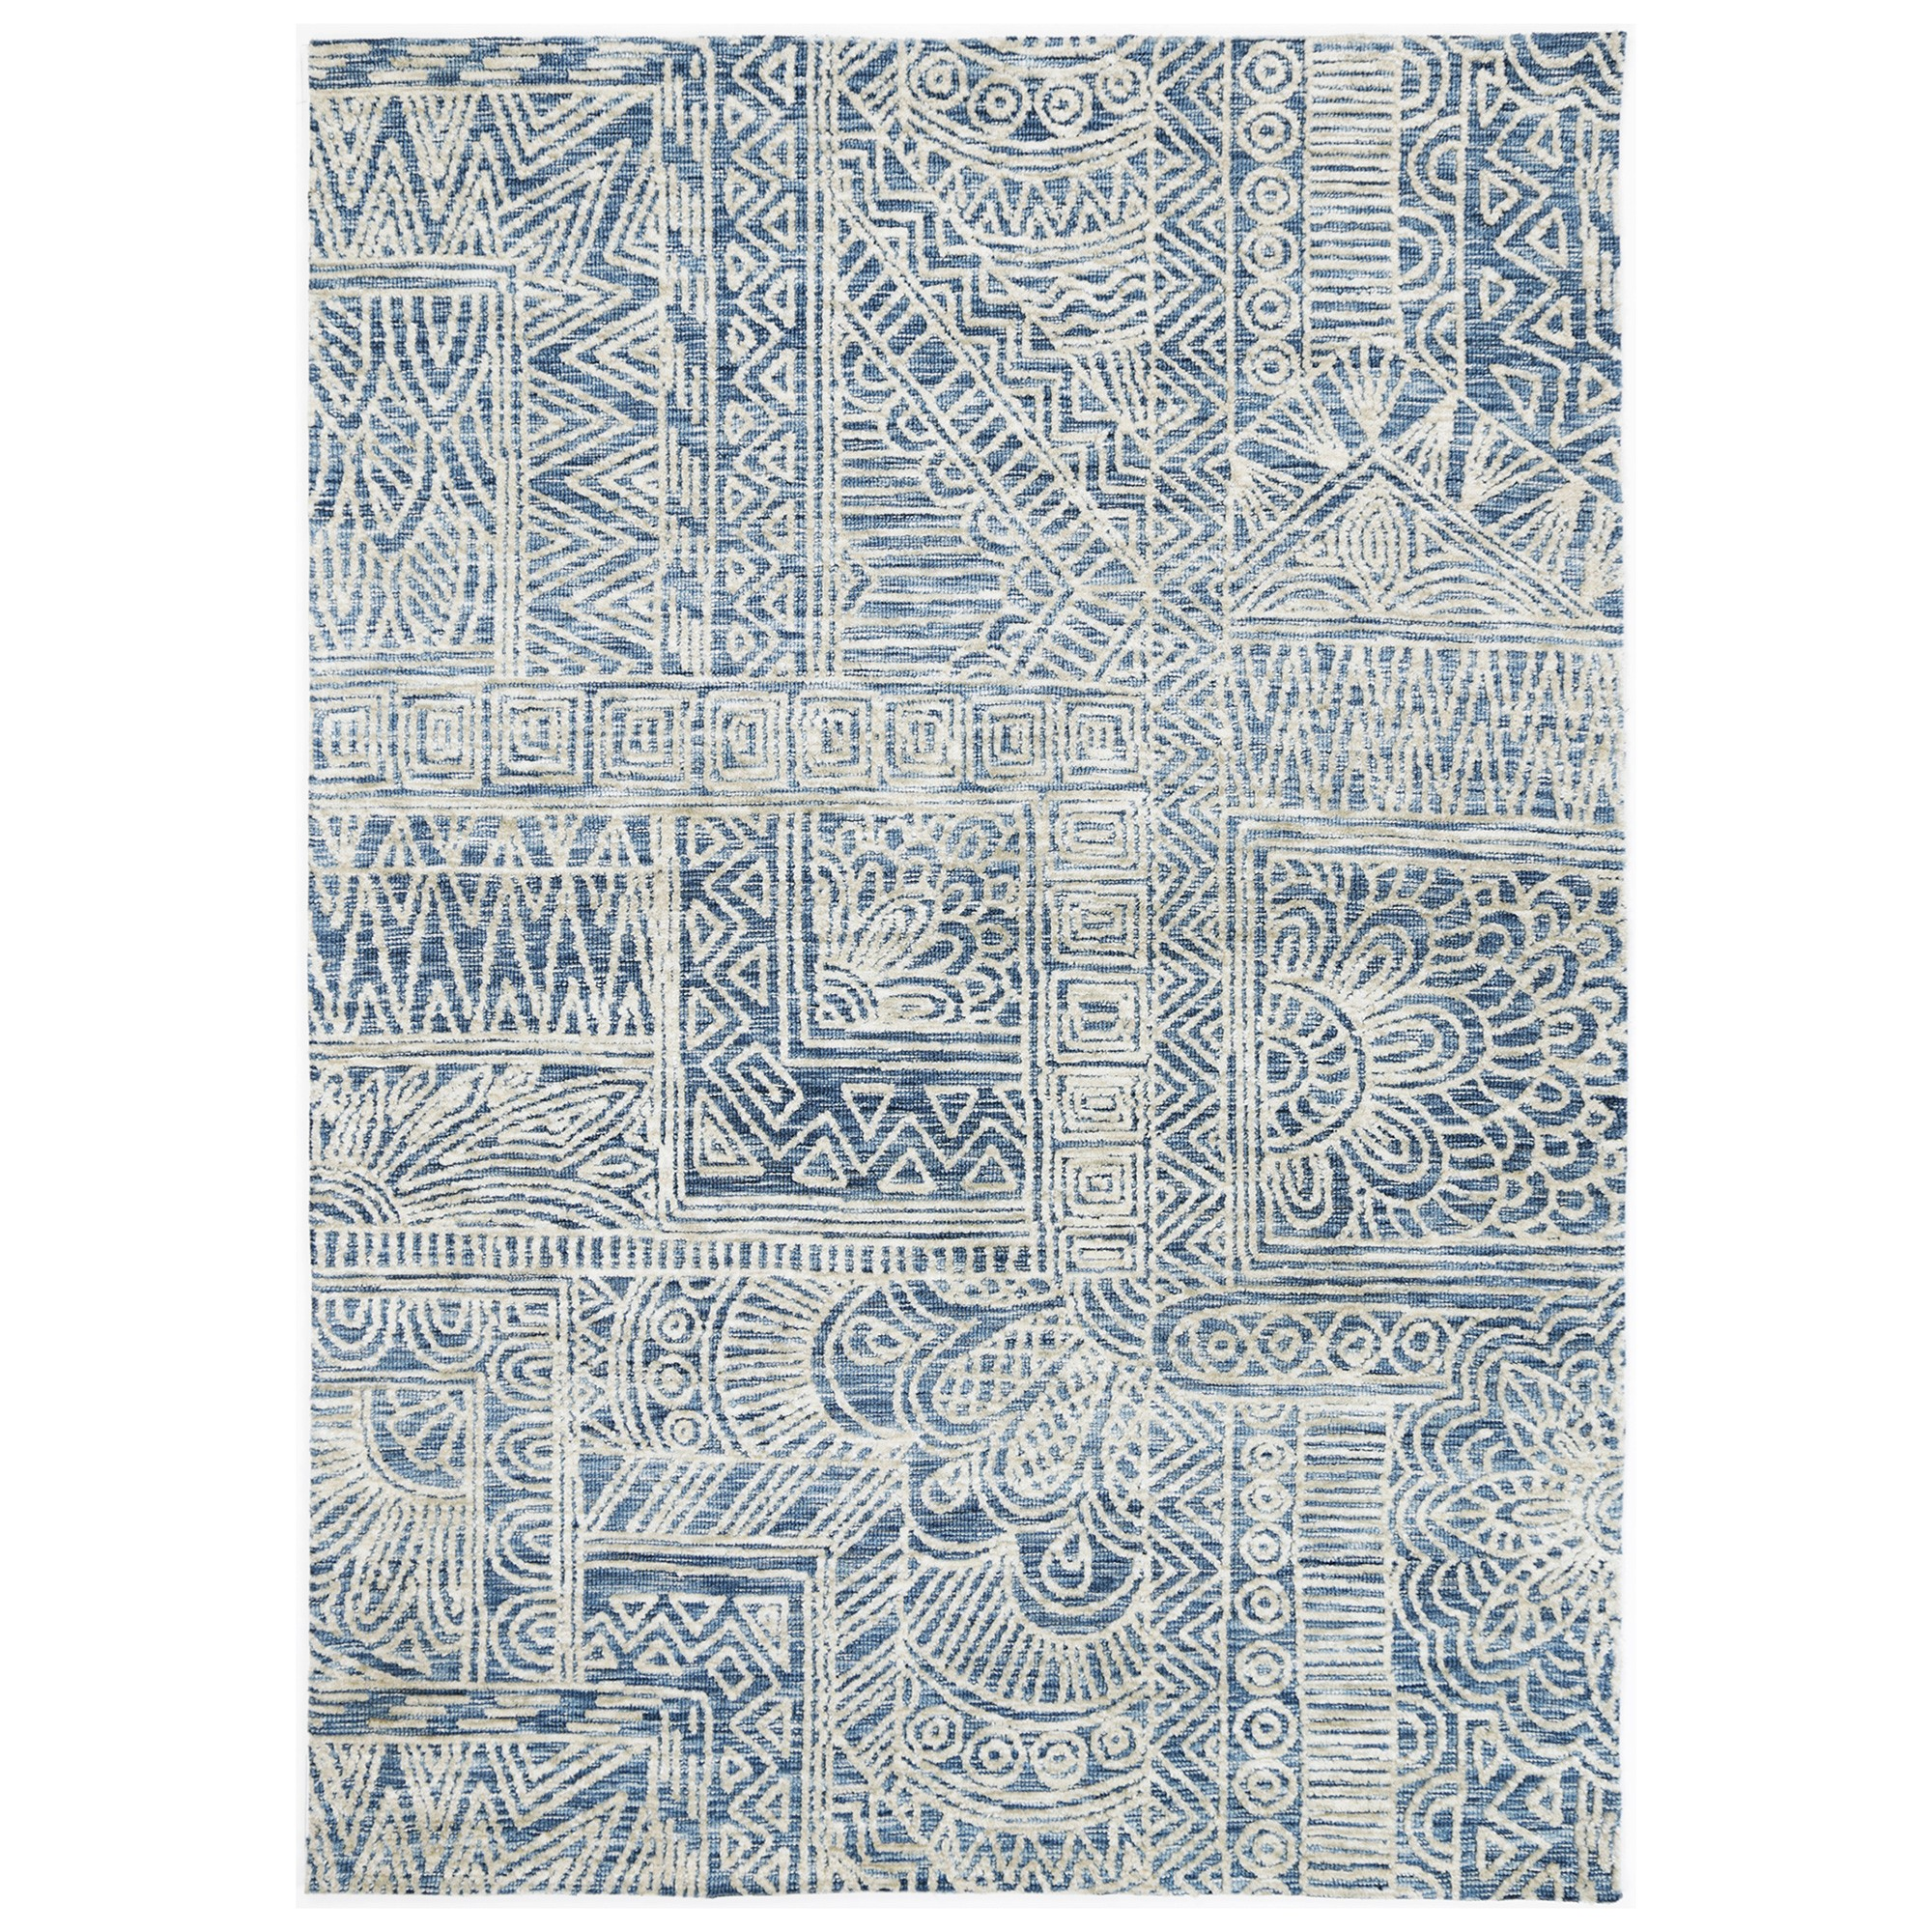 Amristar Newburg Hand Tufted Wool Rug, 330x240cm, Navy